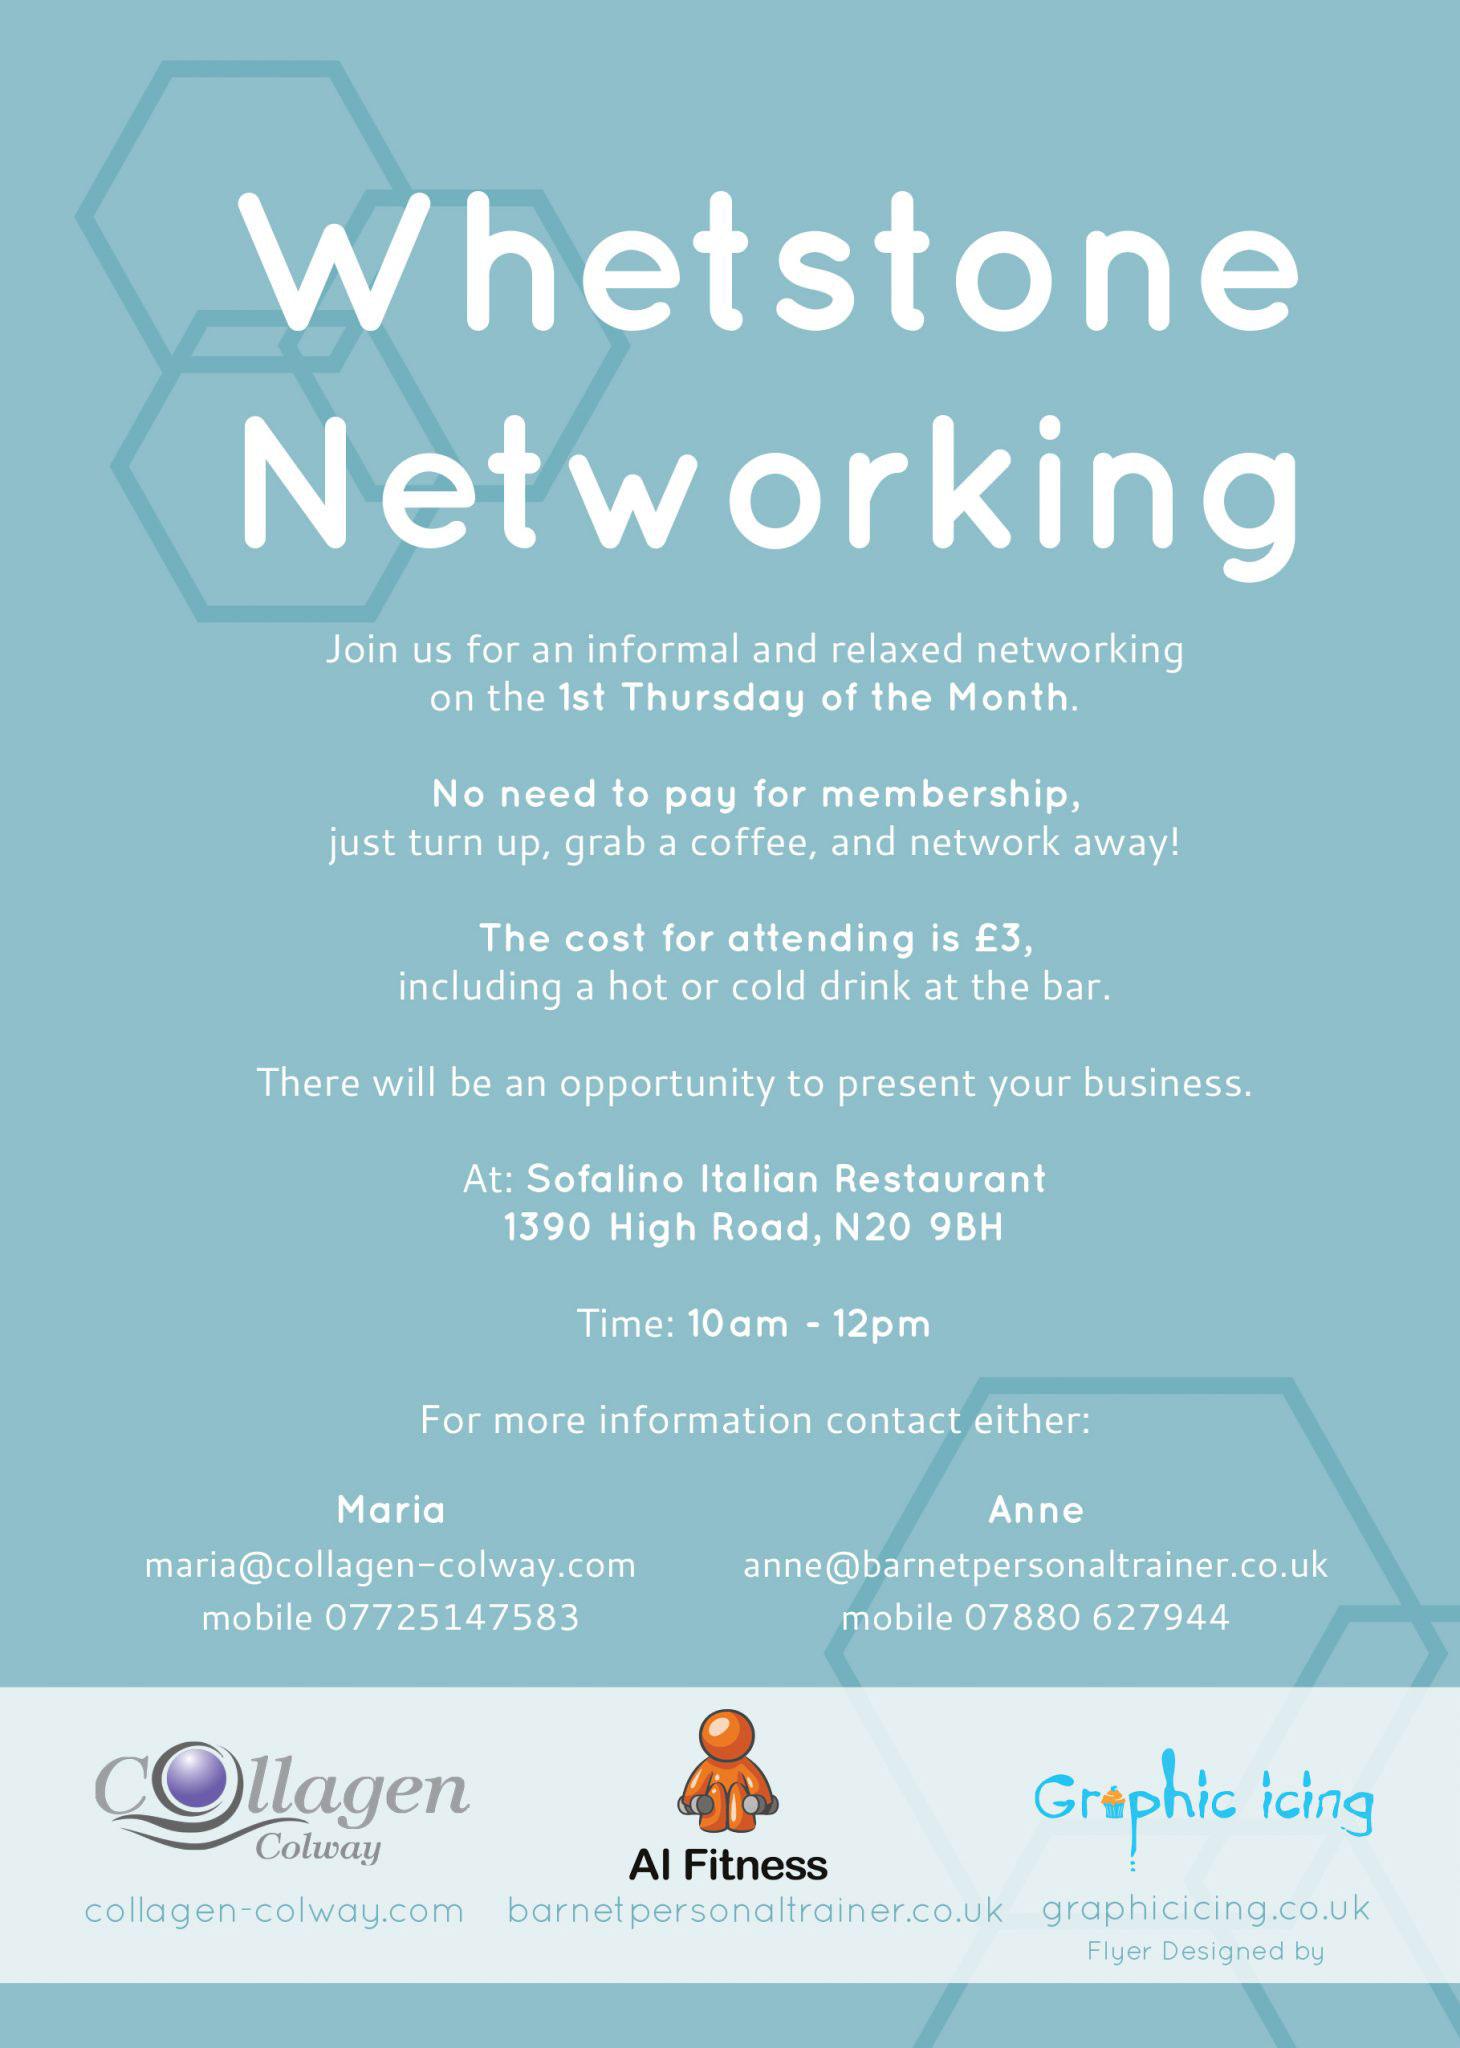 Whetstone Networking Flyer Design